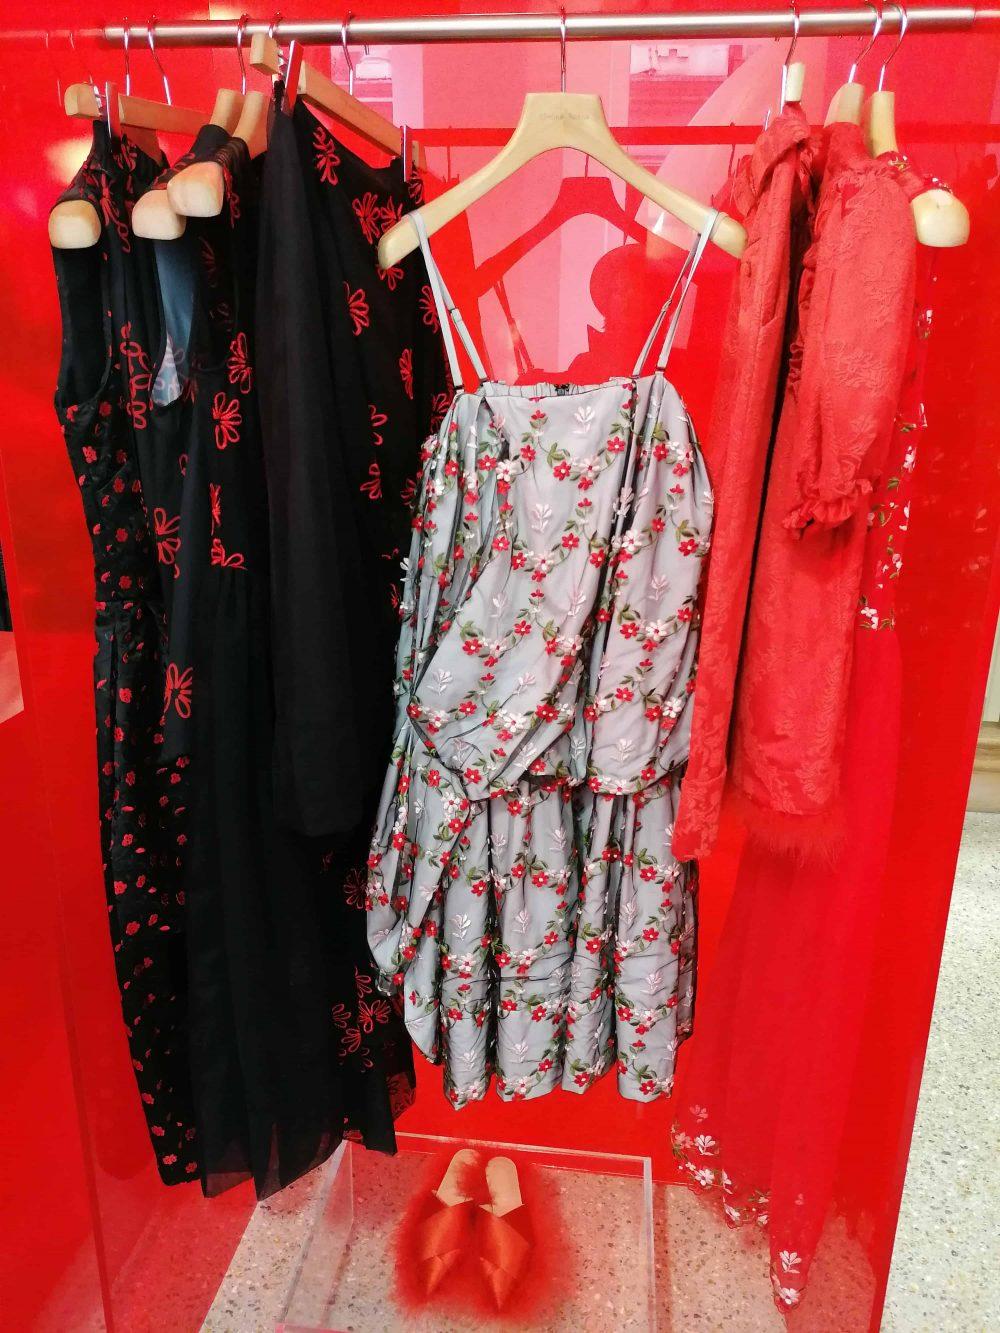 dress by fashion designer Simone Rocha, Dover Street Market, St. James's, Latest in Design Tour, Fashion Tours London